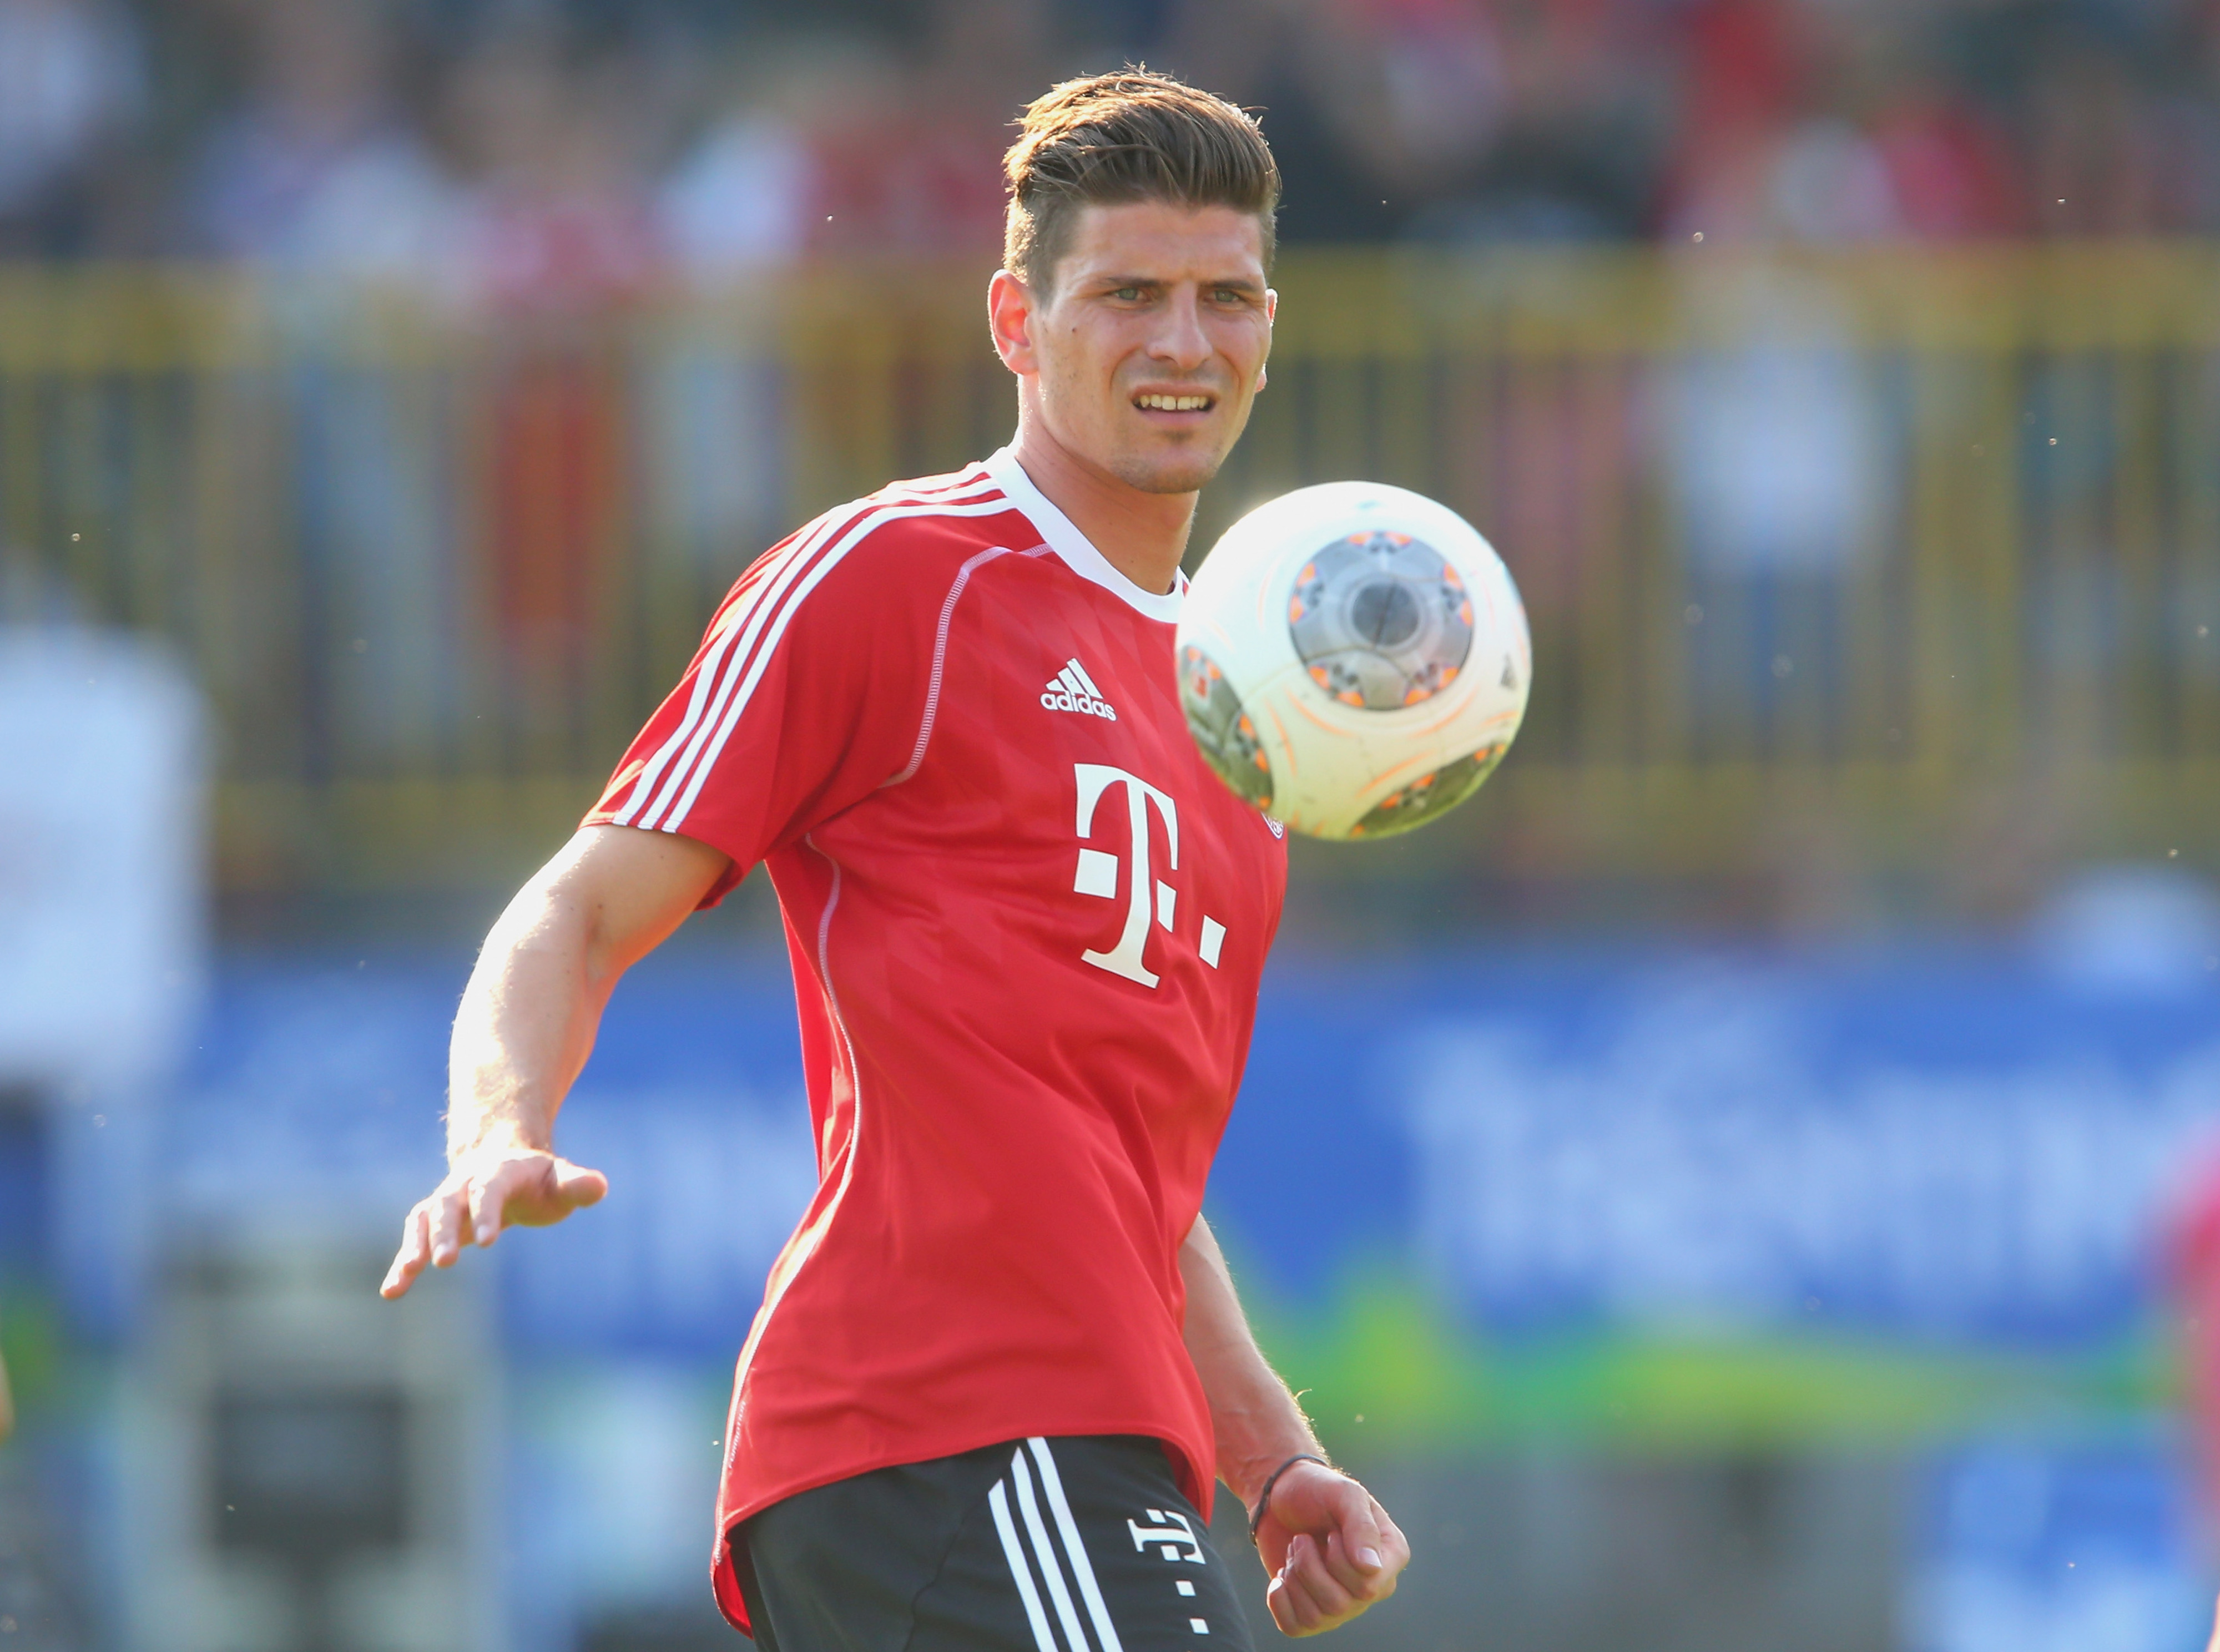 Bayern Munich agree to sell Mario Gomez to Fiorentina